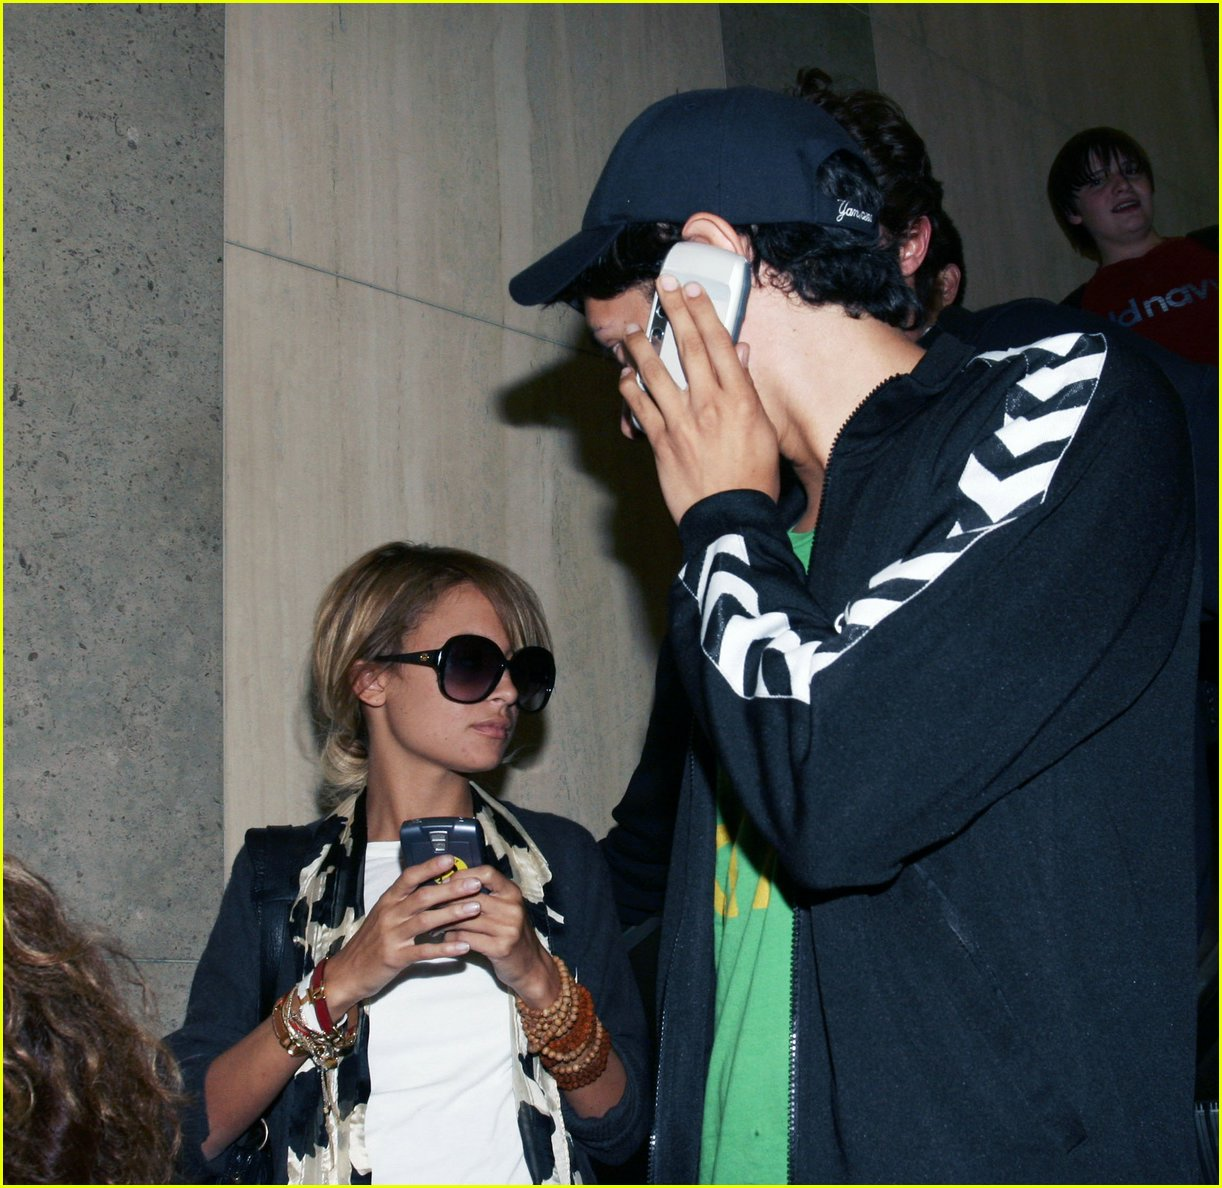 Nicole Richie & Brody Jenner Holding Hands Nicole Richie